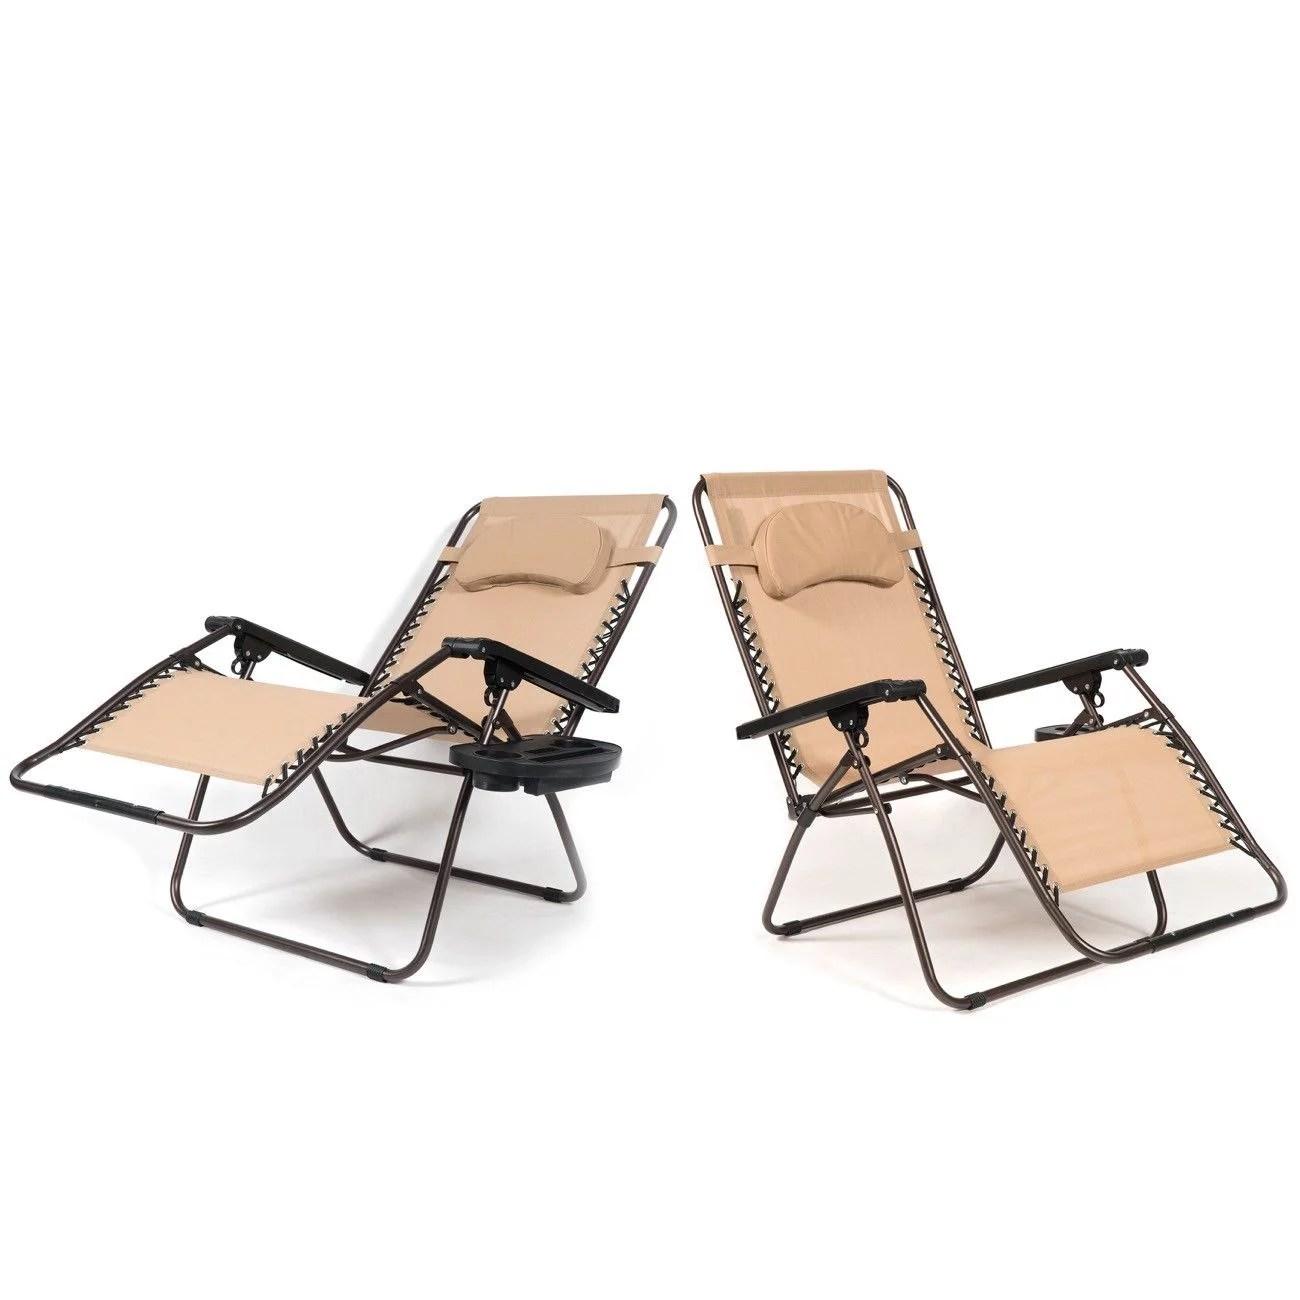 Ghp 2 Pcs Beige Breathable Mesh 51 Lx37 5 Wx37 H Oversized Zero Gravity Lounge Chair